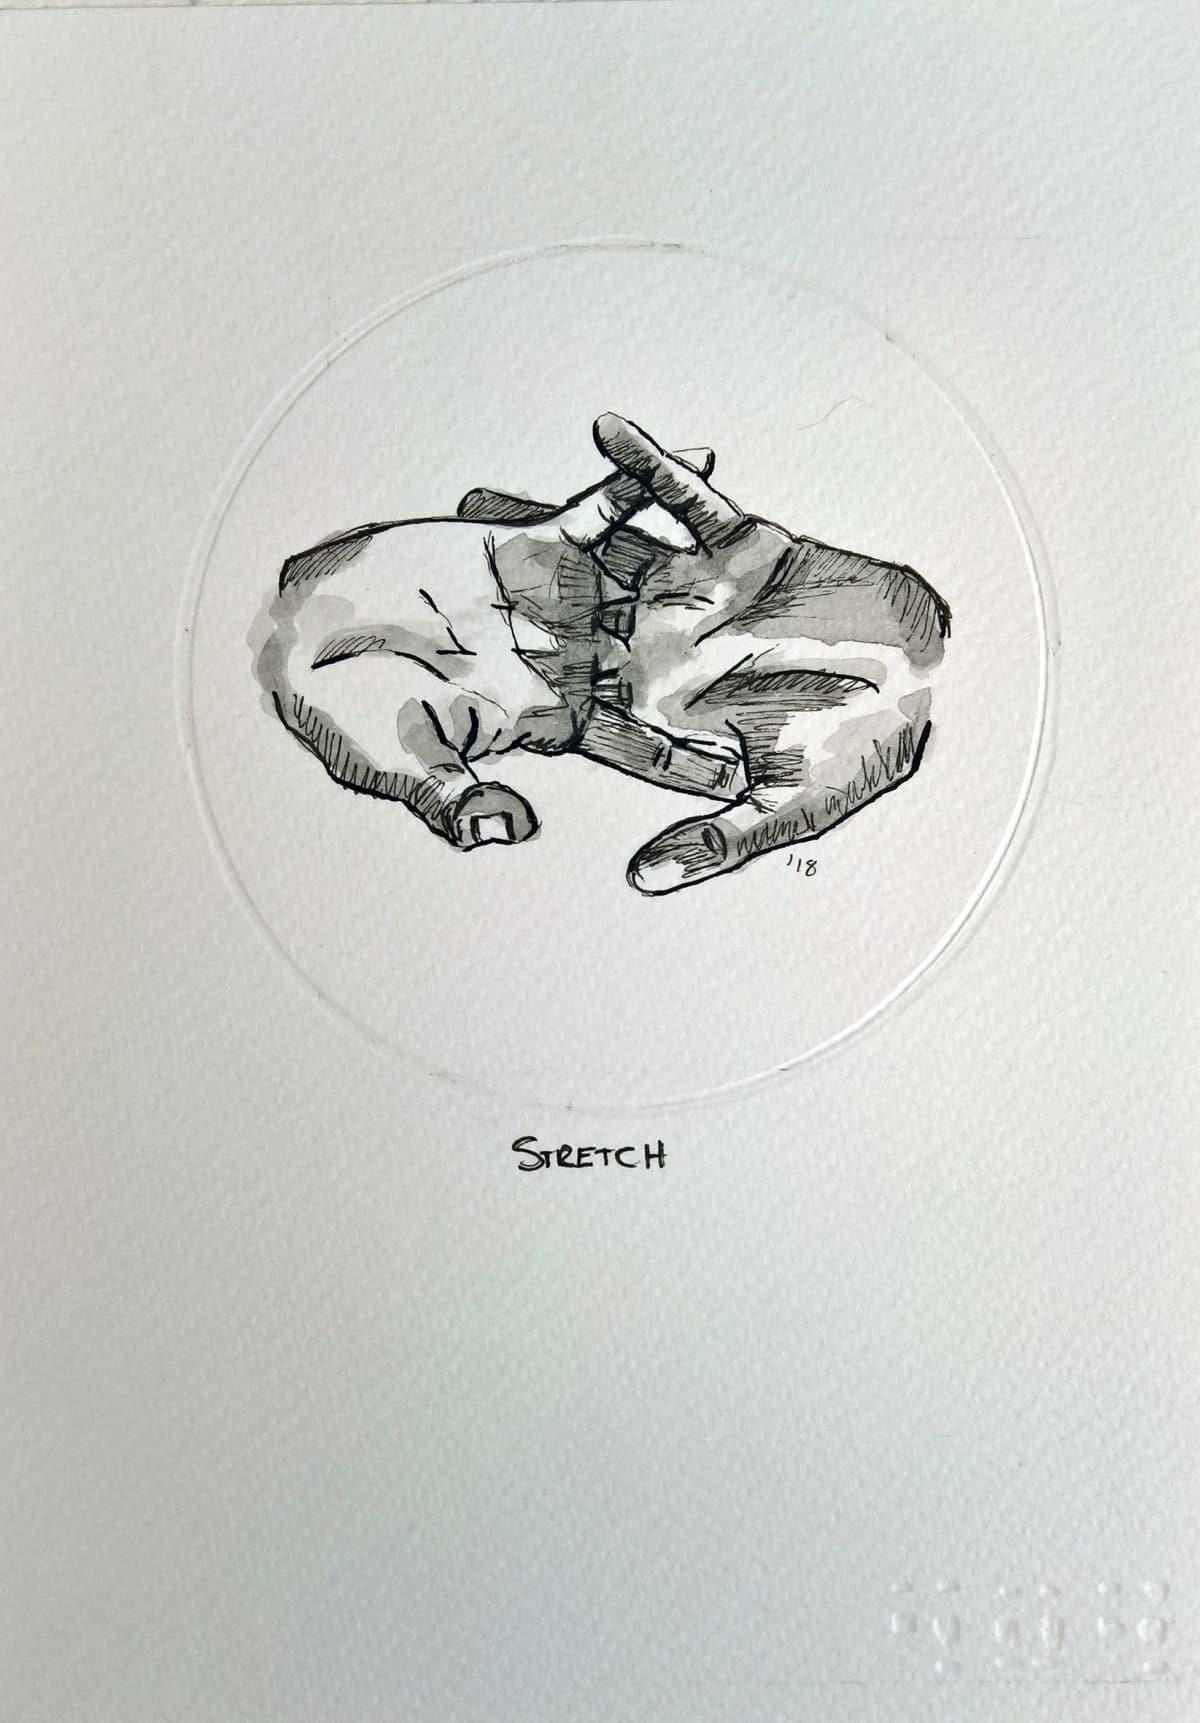 404, Stretch (B), 2018